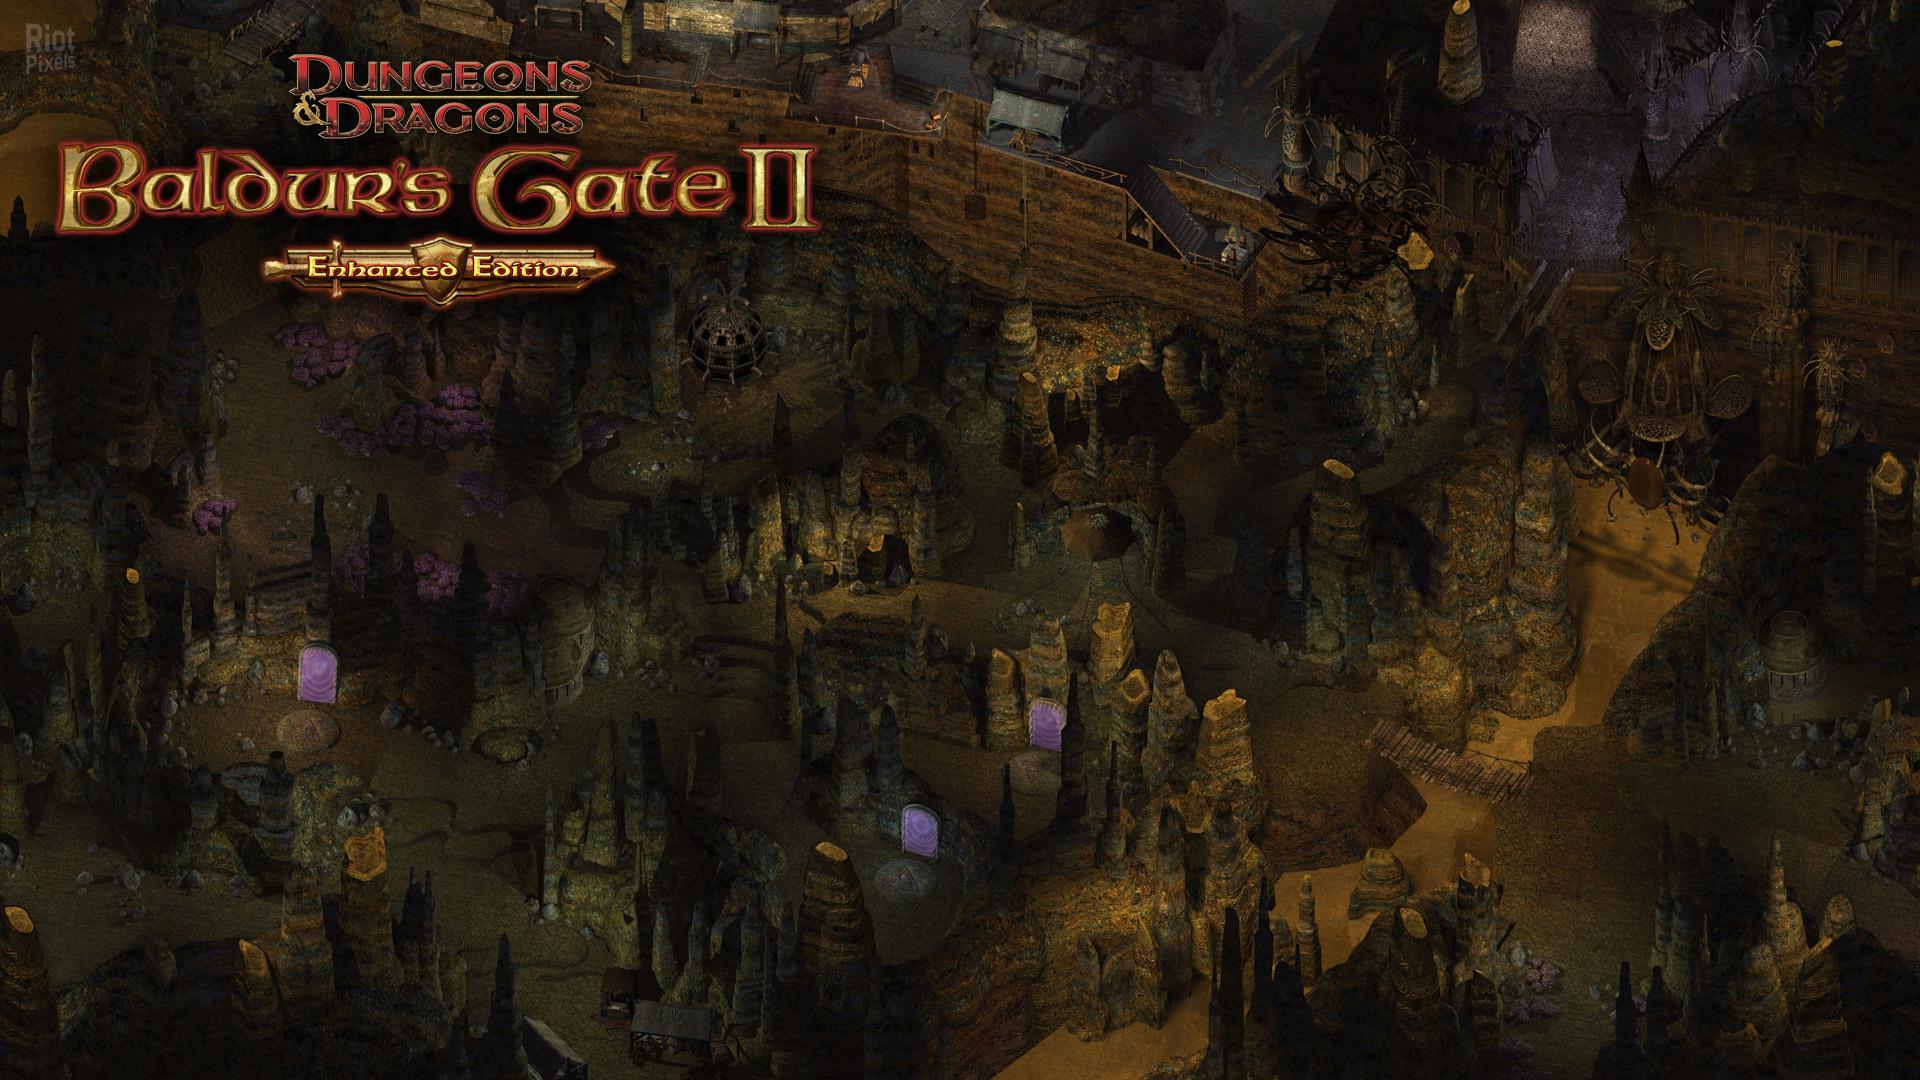 Baldurs Gate Ii Enhanced Edition Wallpapers Wallpaper Cave